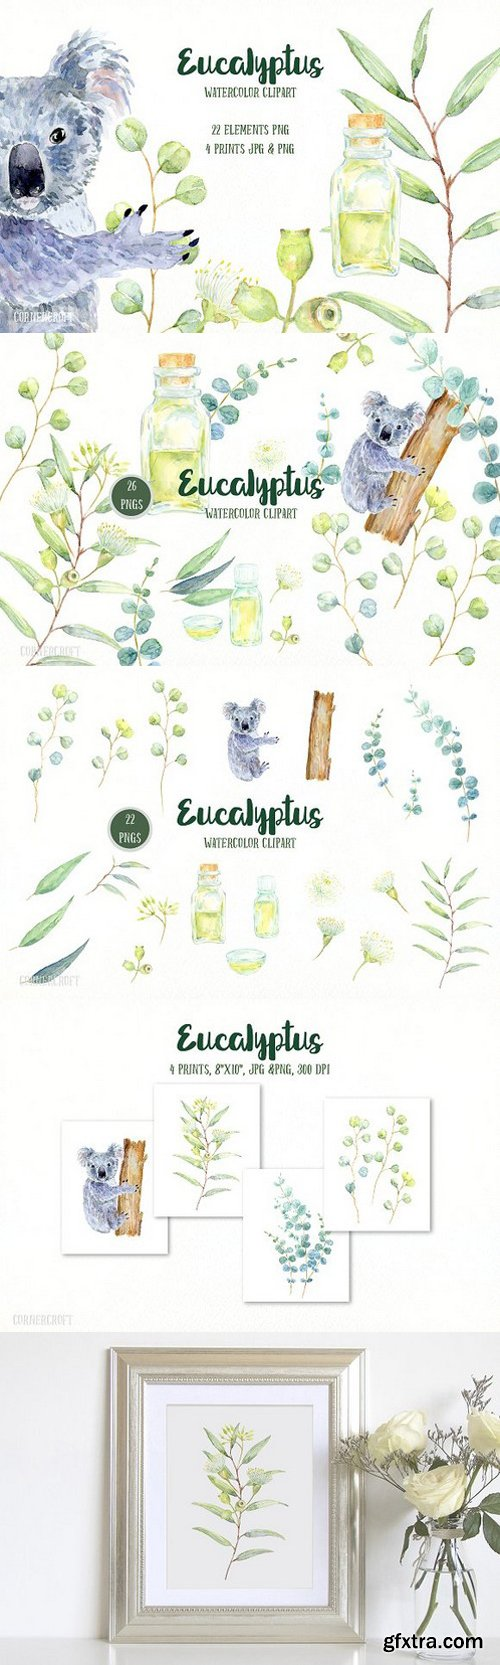 Watercolor Eucalyptus Koala Clip Art